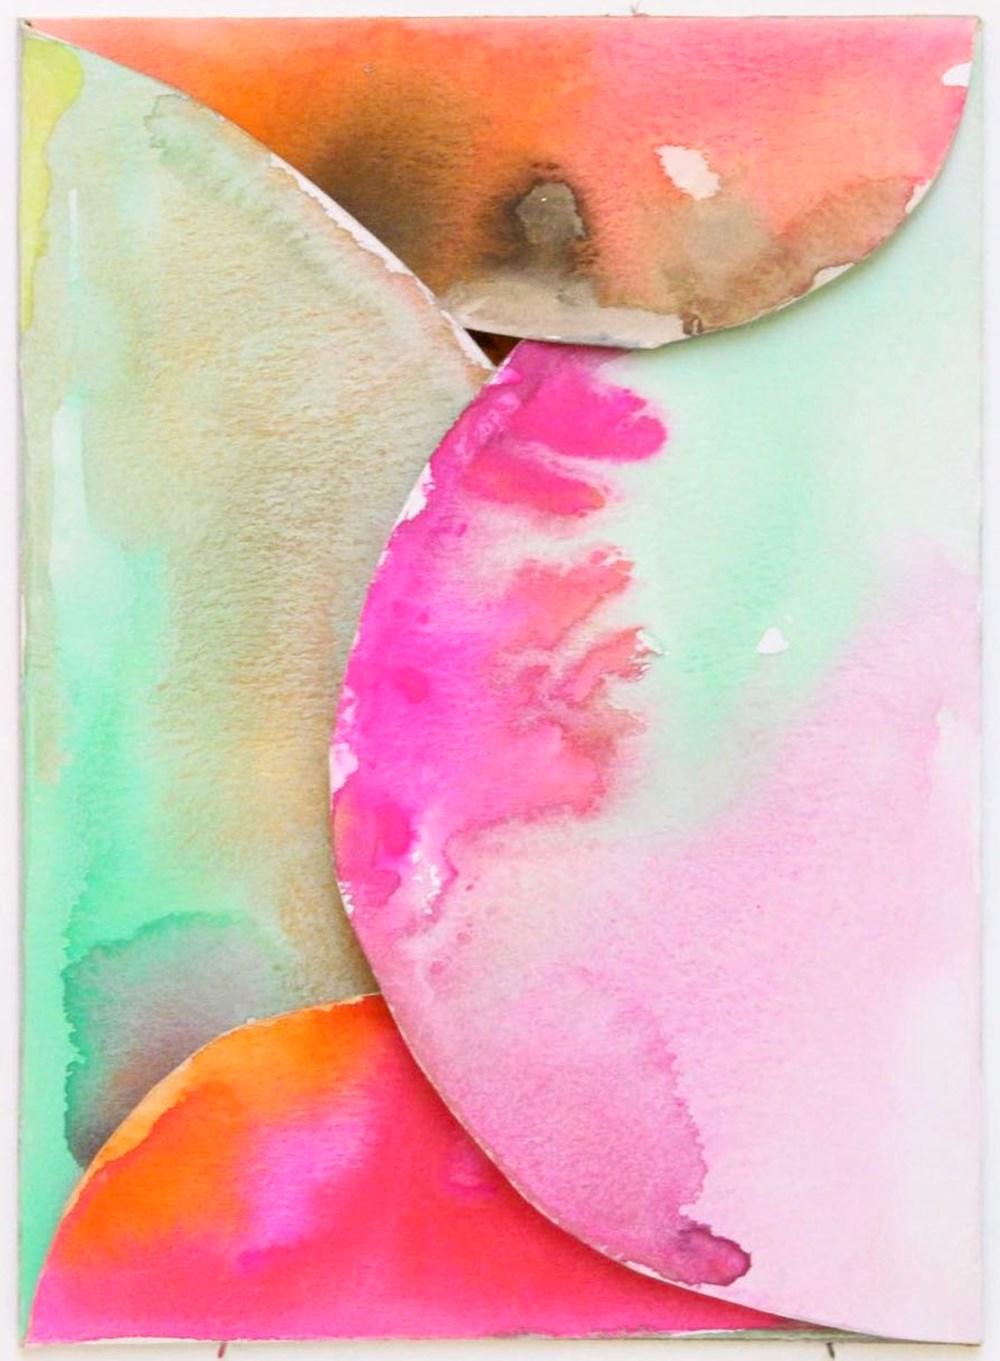 Life on Venus III | The Organic, Live Auction - Lot 11, Sophie Mackfall, Antibody Test at Sunset